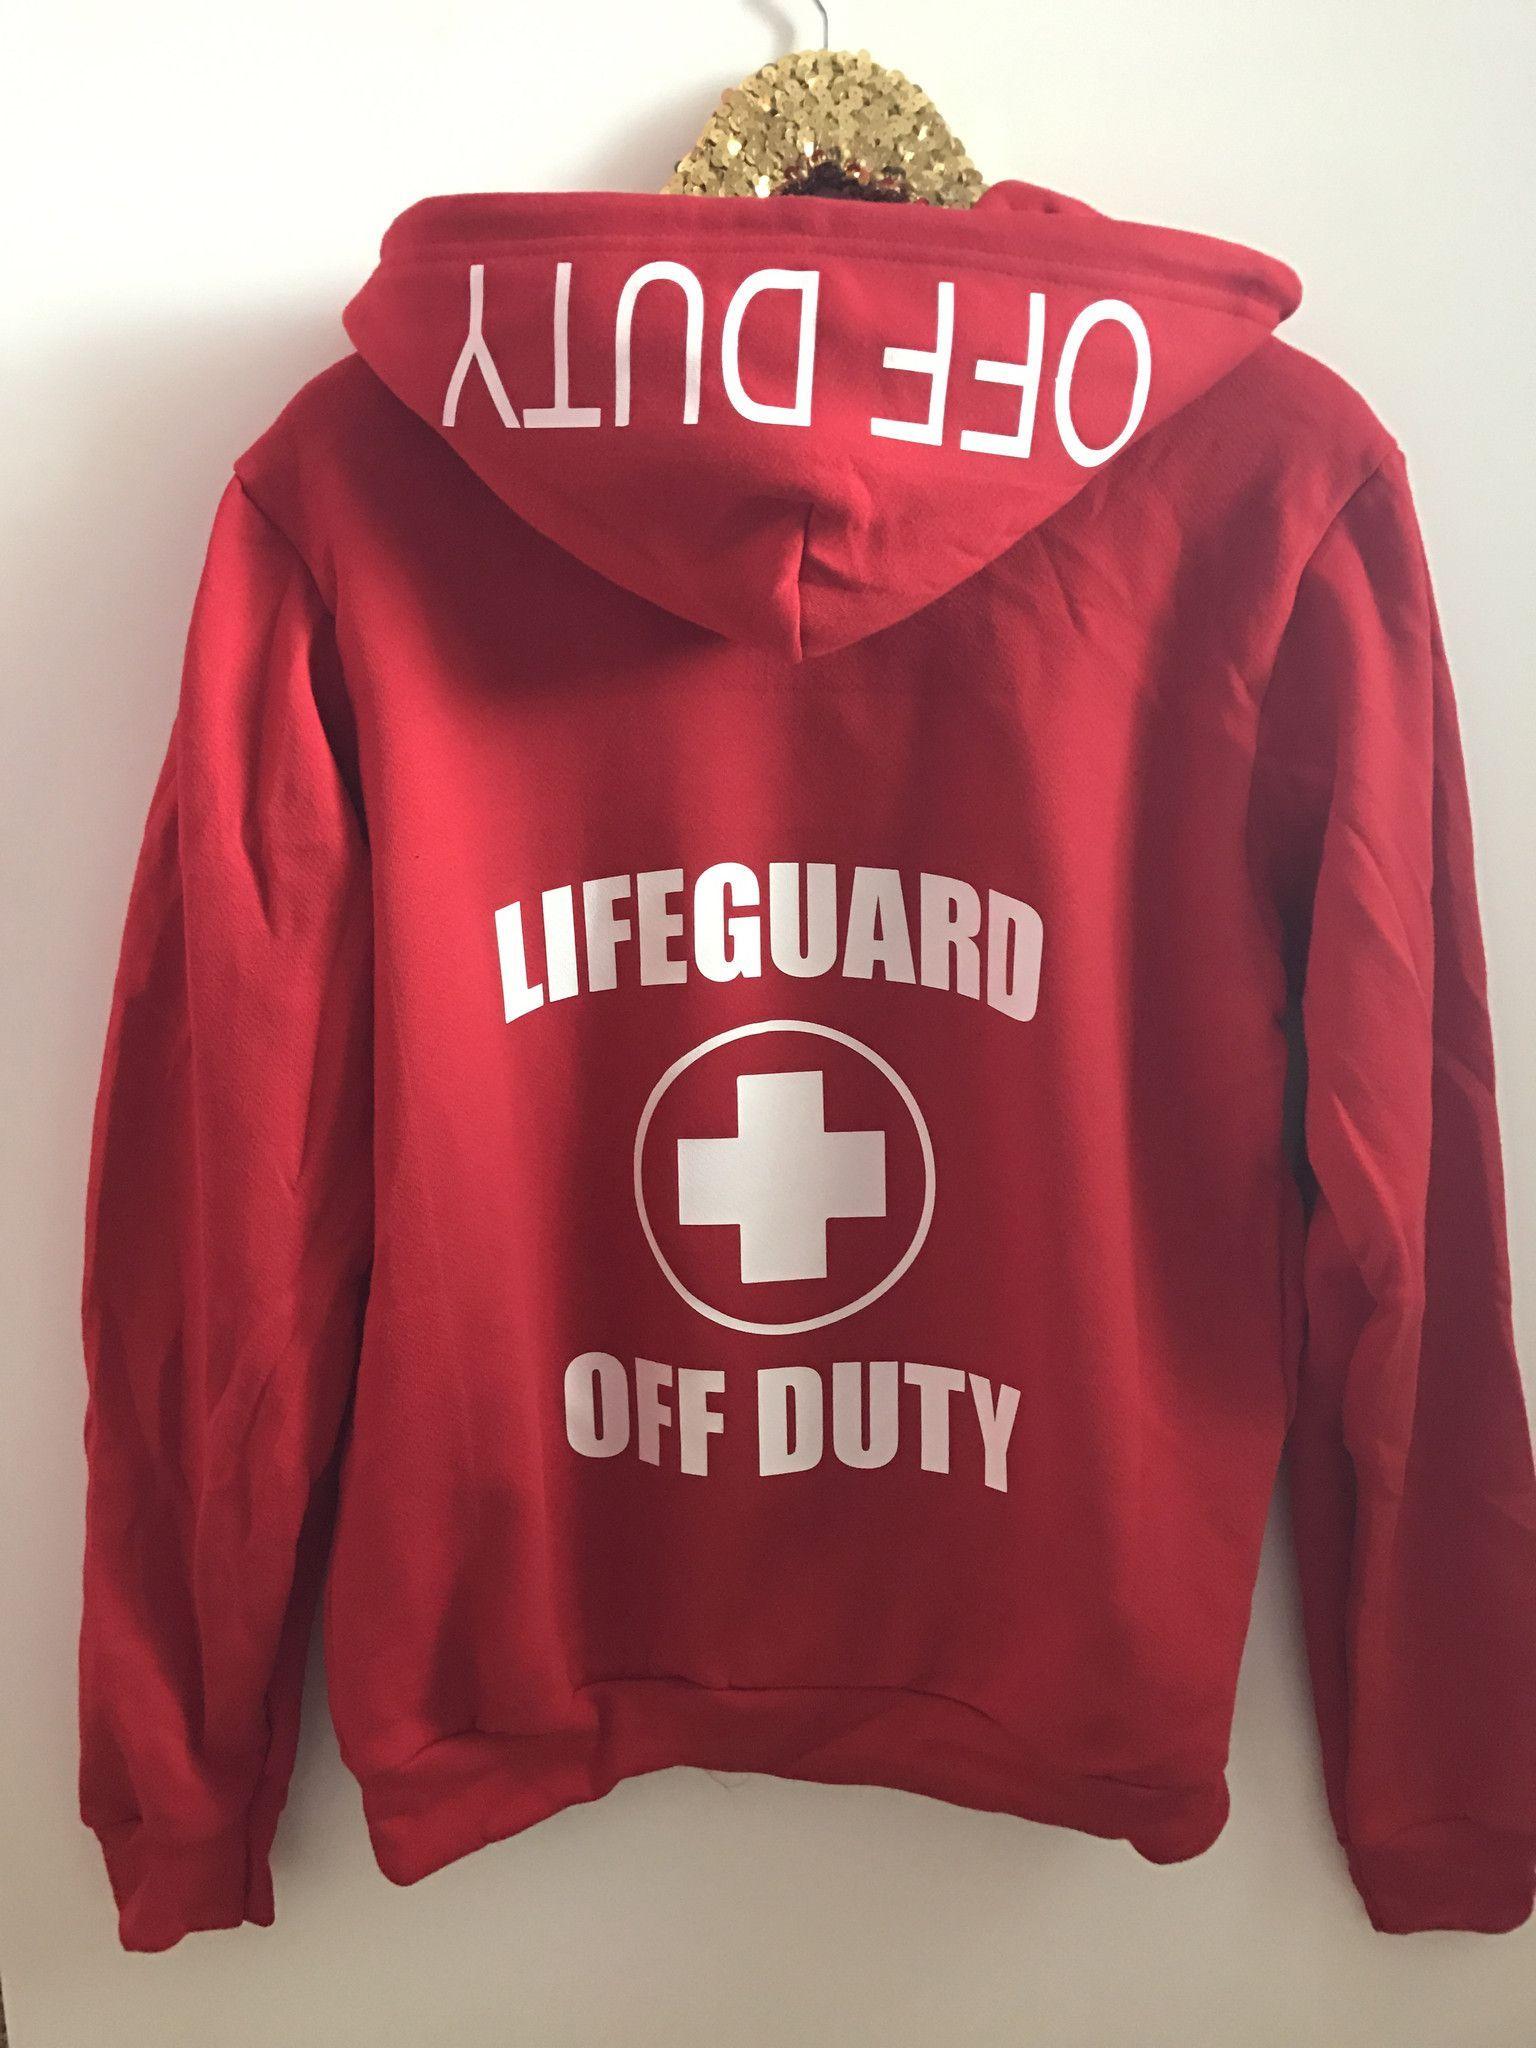 9774dbca3585e Where To Buy Lifeguard Sweatshirts - BCD Tofu House